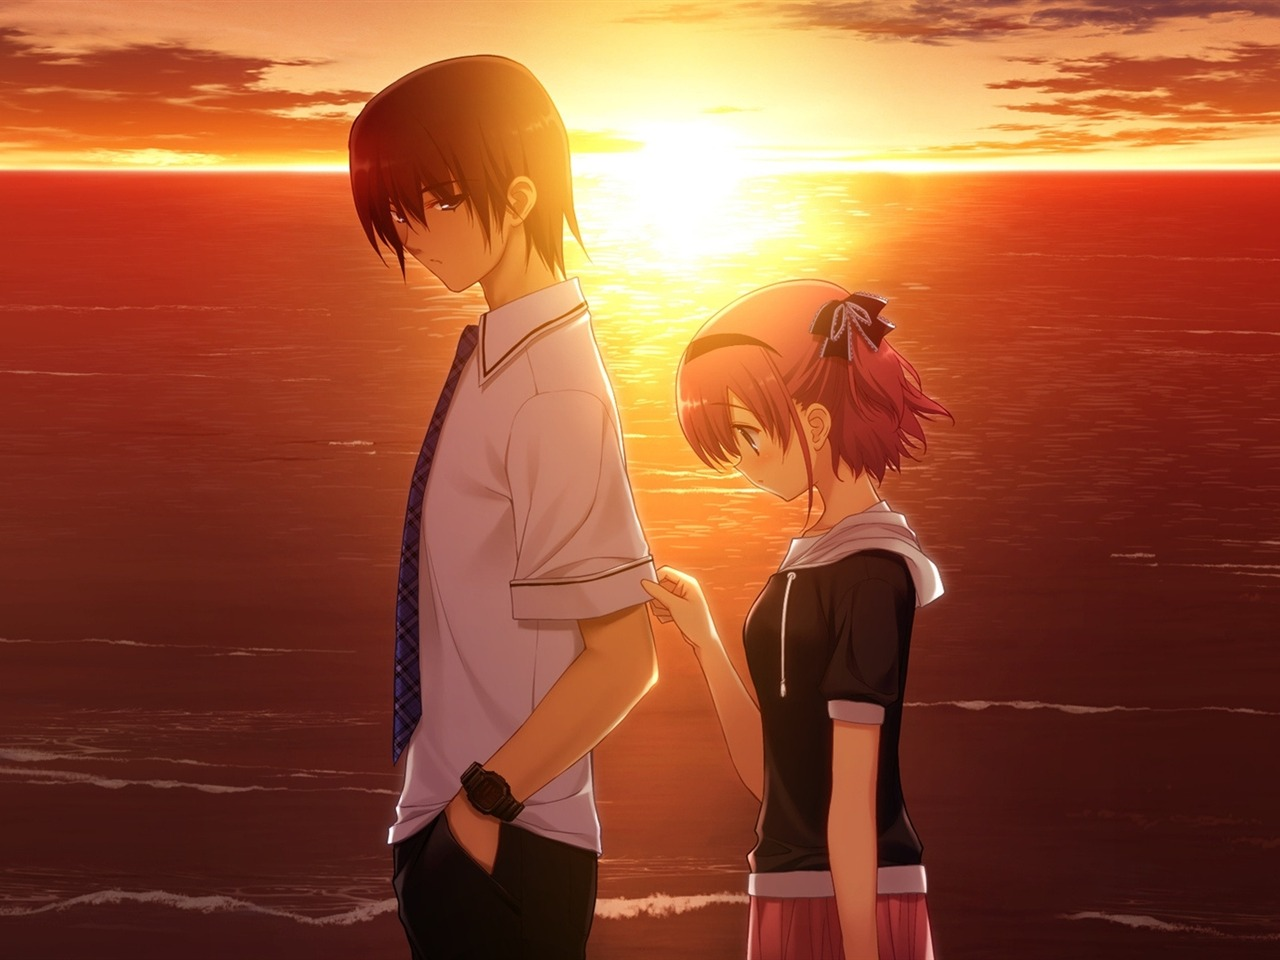 boy girl sad sunset sea-2013 Anime HD Wallpaper Preview